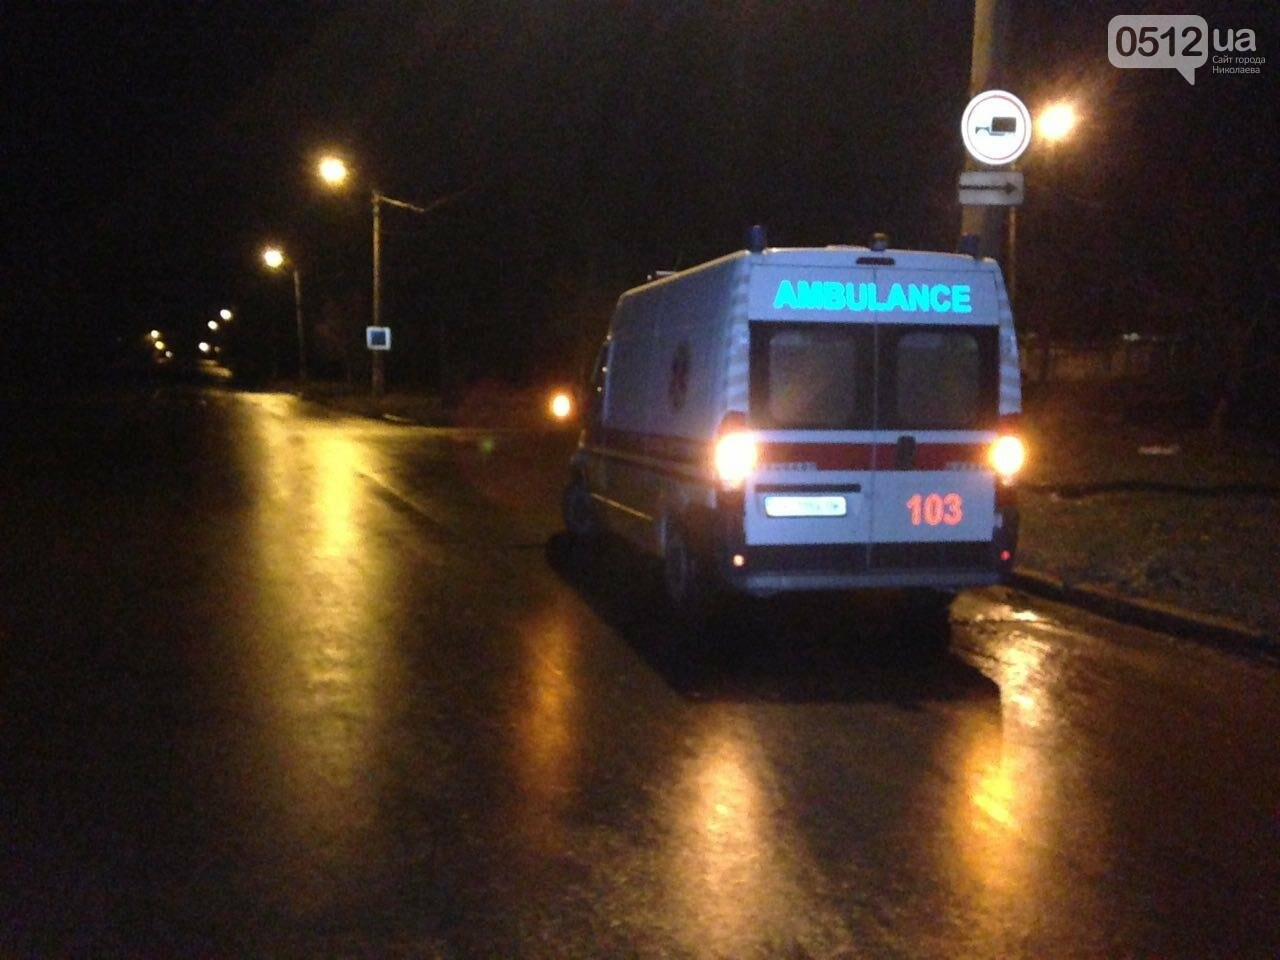 Страшное ДТП в Николаеве: 2 парня и 2 девушки на Мазде влетели в дерево - водитель умер на месте аварии, - ФОТО, фото-1